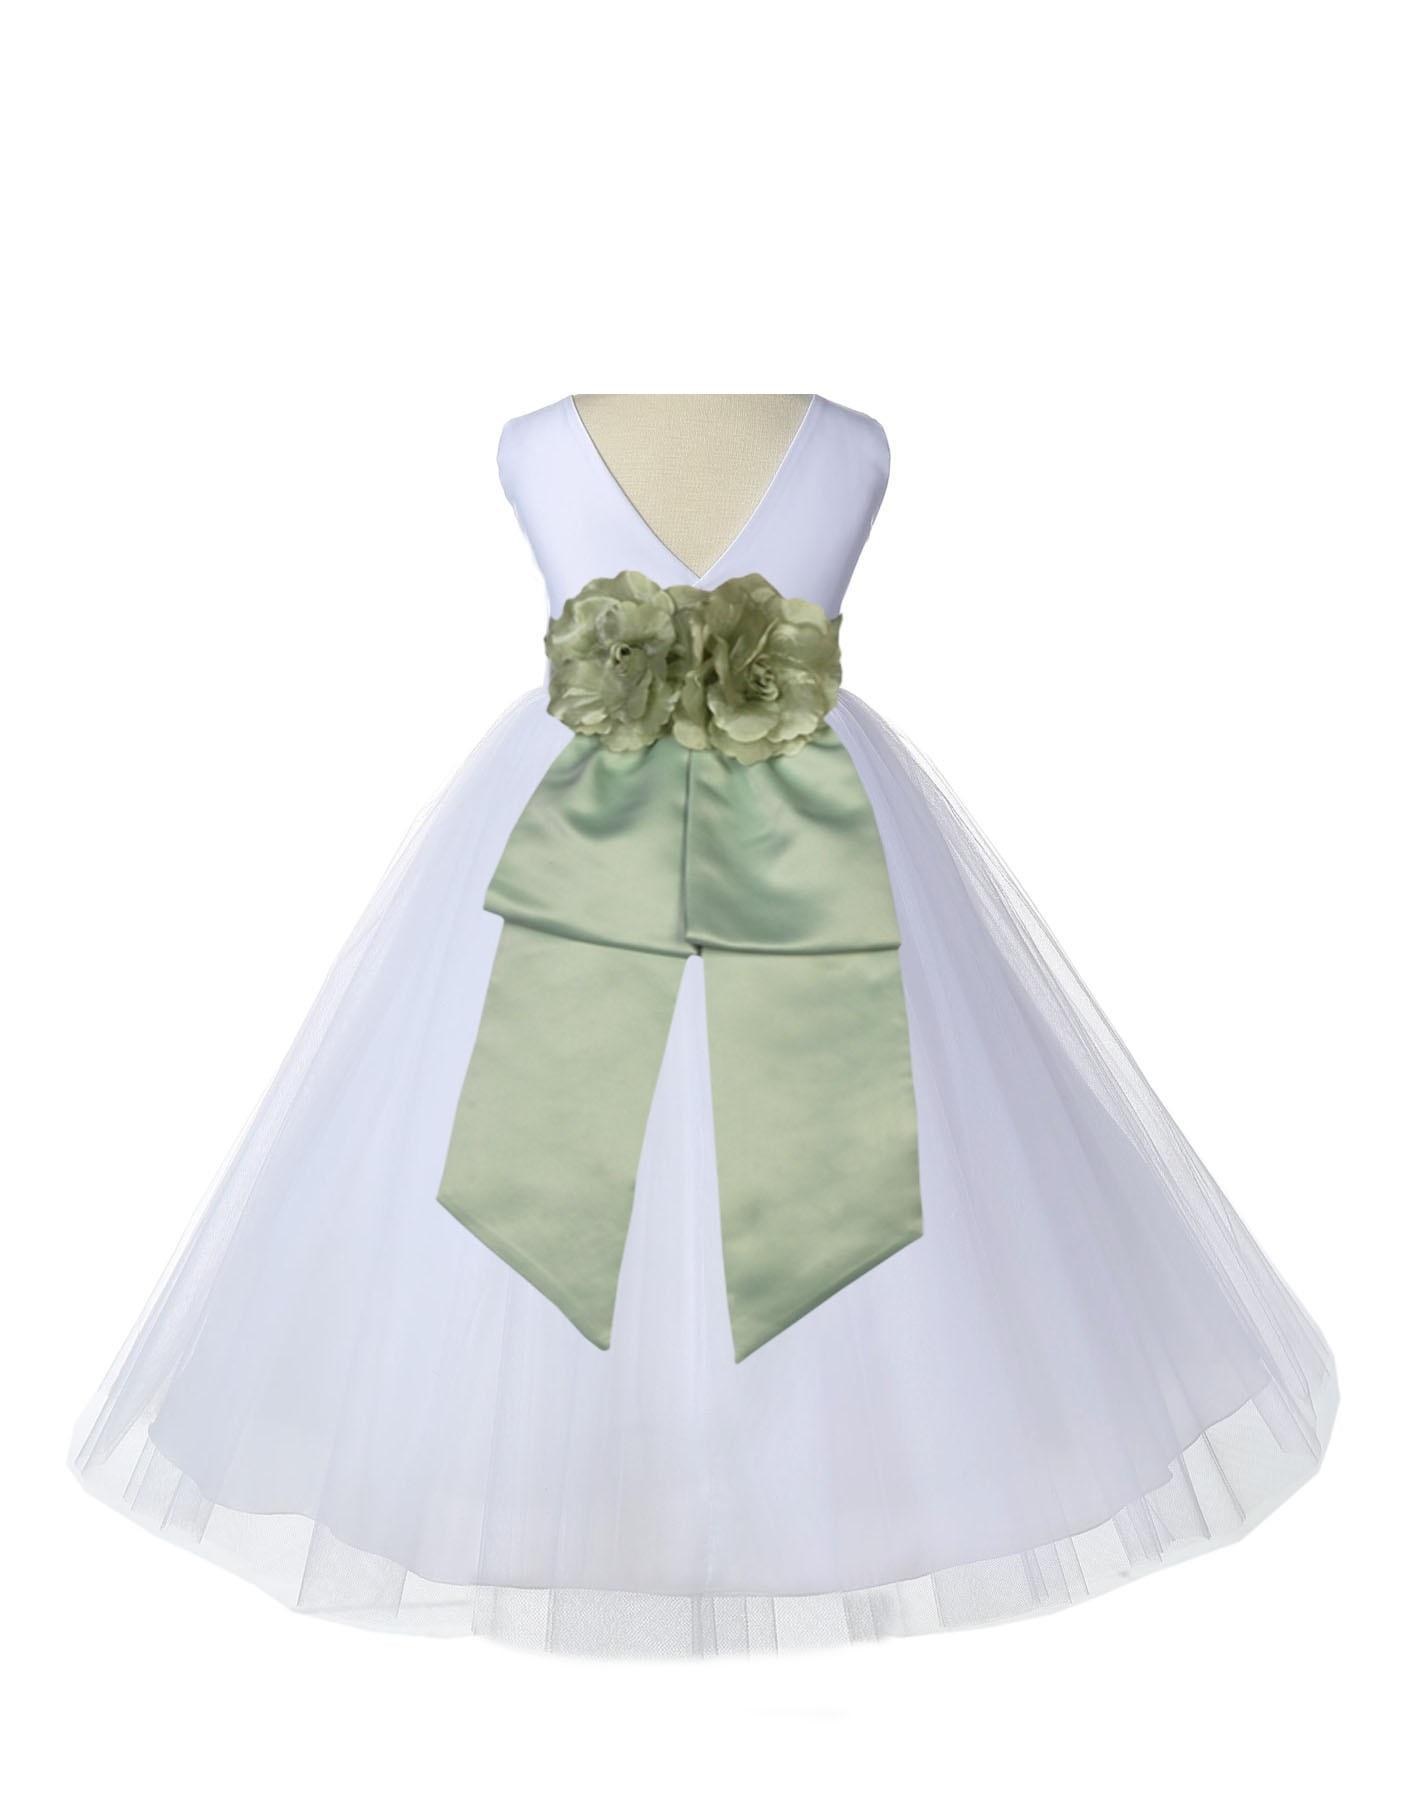 Ekidsbridal V-Shaped Back Neckline White Flower Girl Dress Tulle Junior Bridesmaid Wedding Pageant Toddler Recital Easter Holiday Communion Baptism Formal Occasions 108a